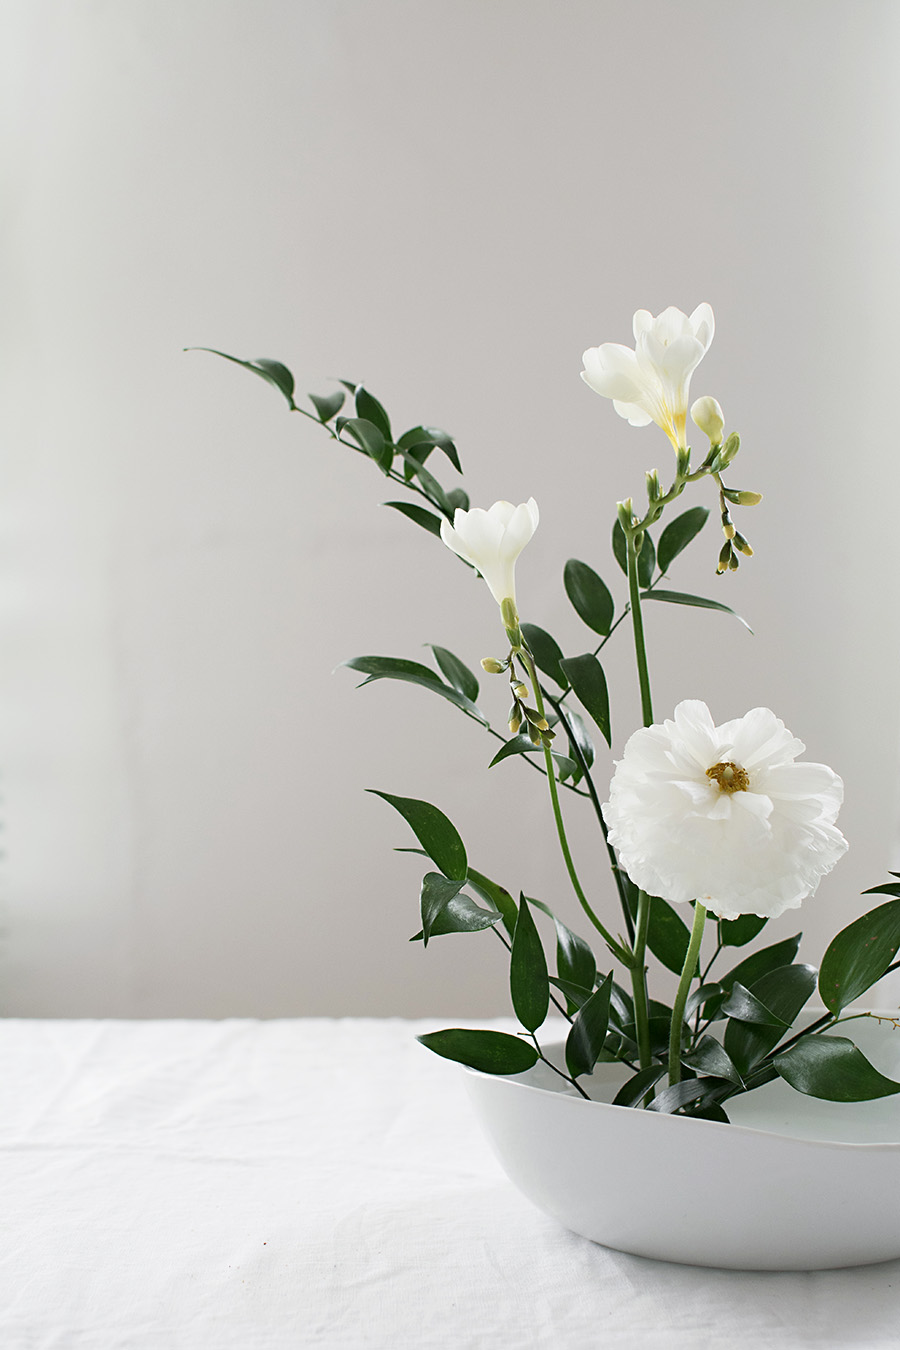 How To Make A Basic Ikebana Floral Arrangement Homey Oh My